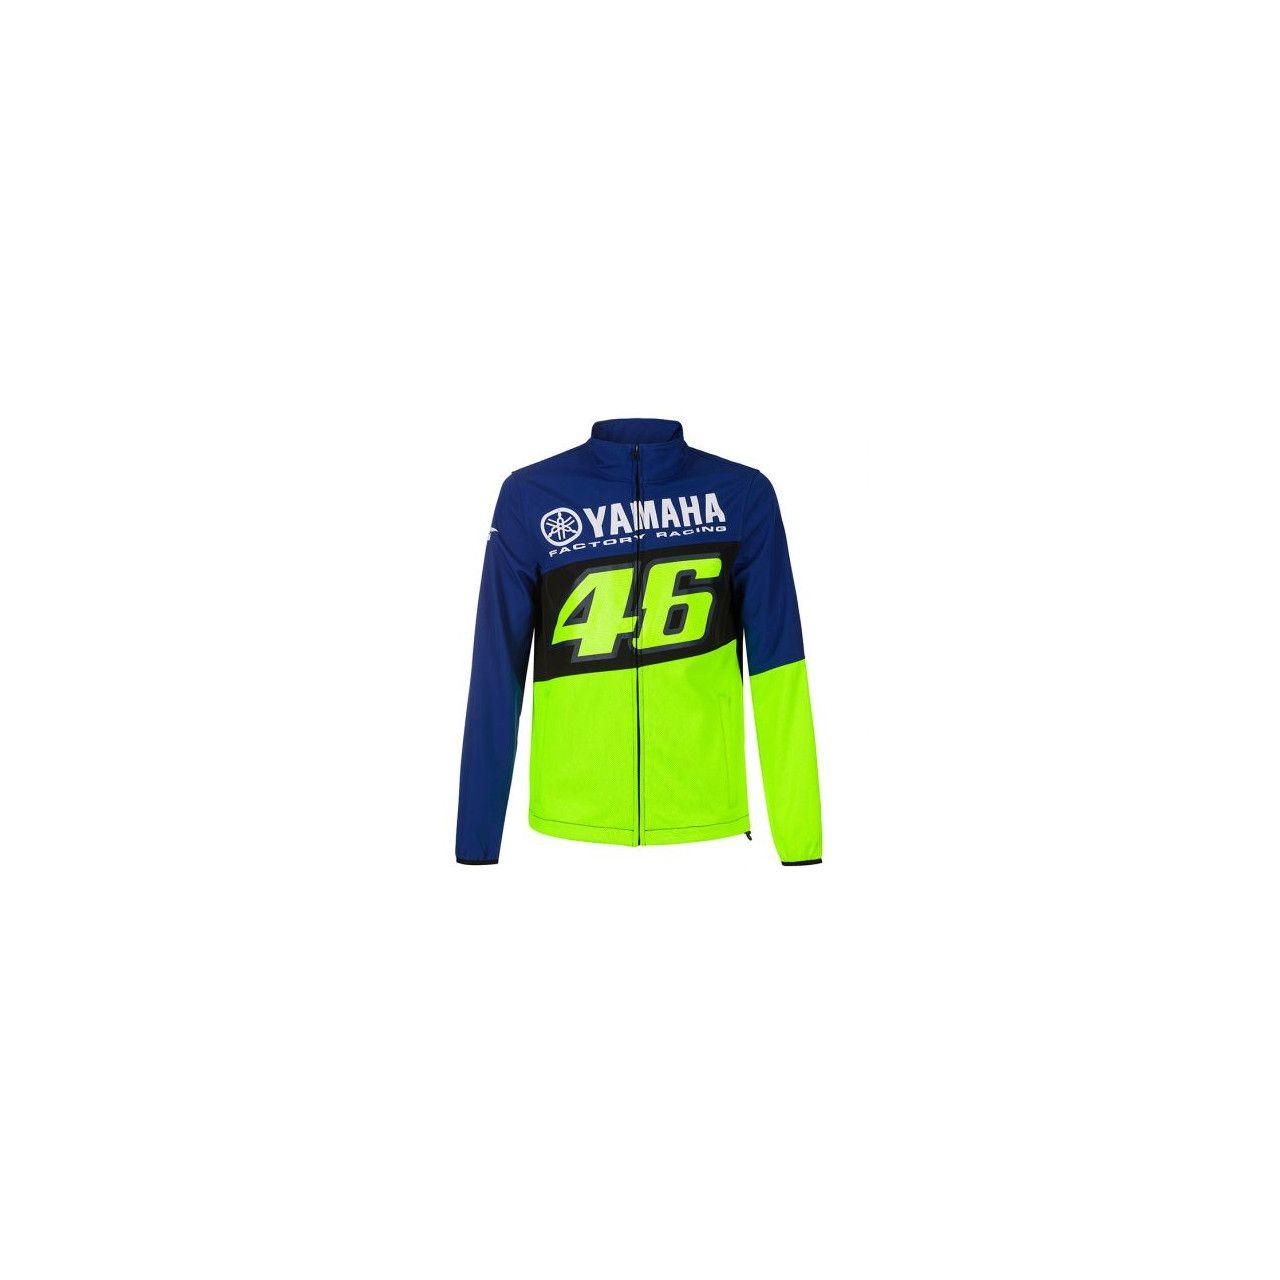 YAMAHA Veste softshell homme Racing VR46 2020